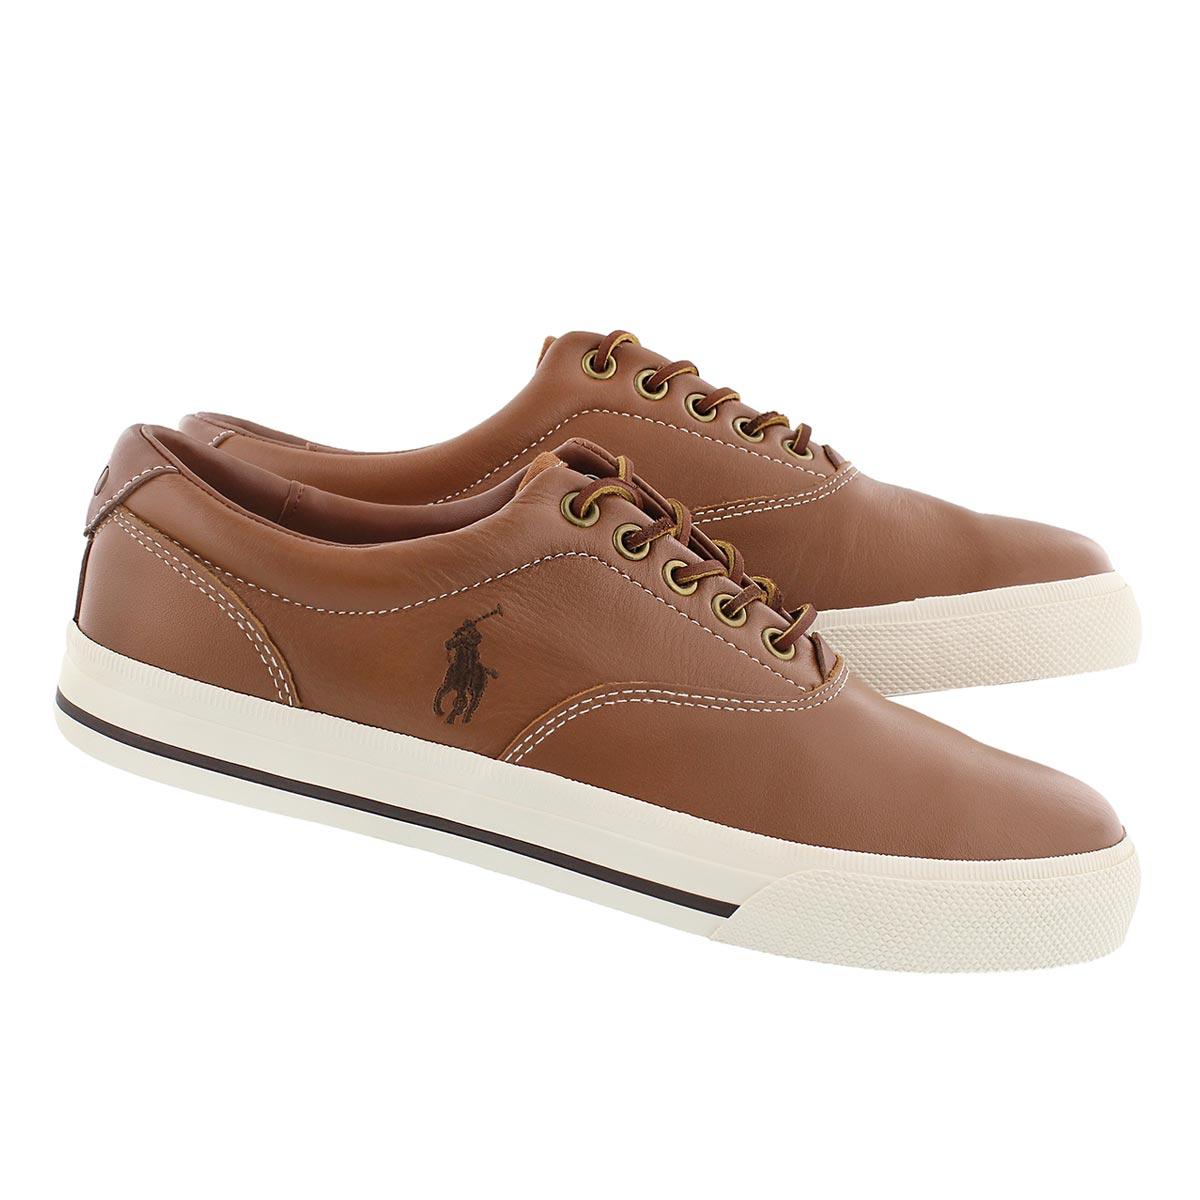 Mns Vaughn tan leather CVO